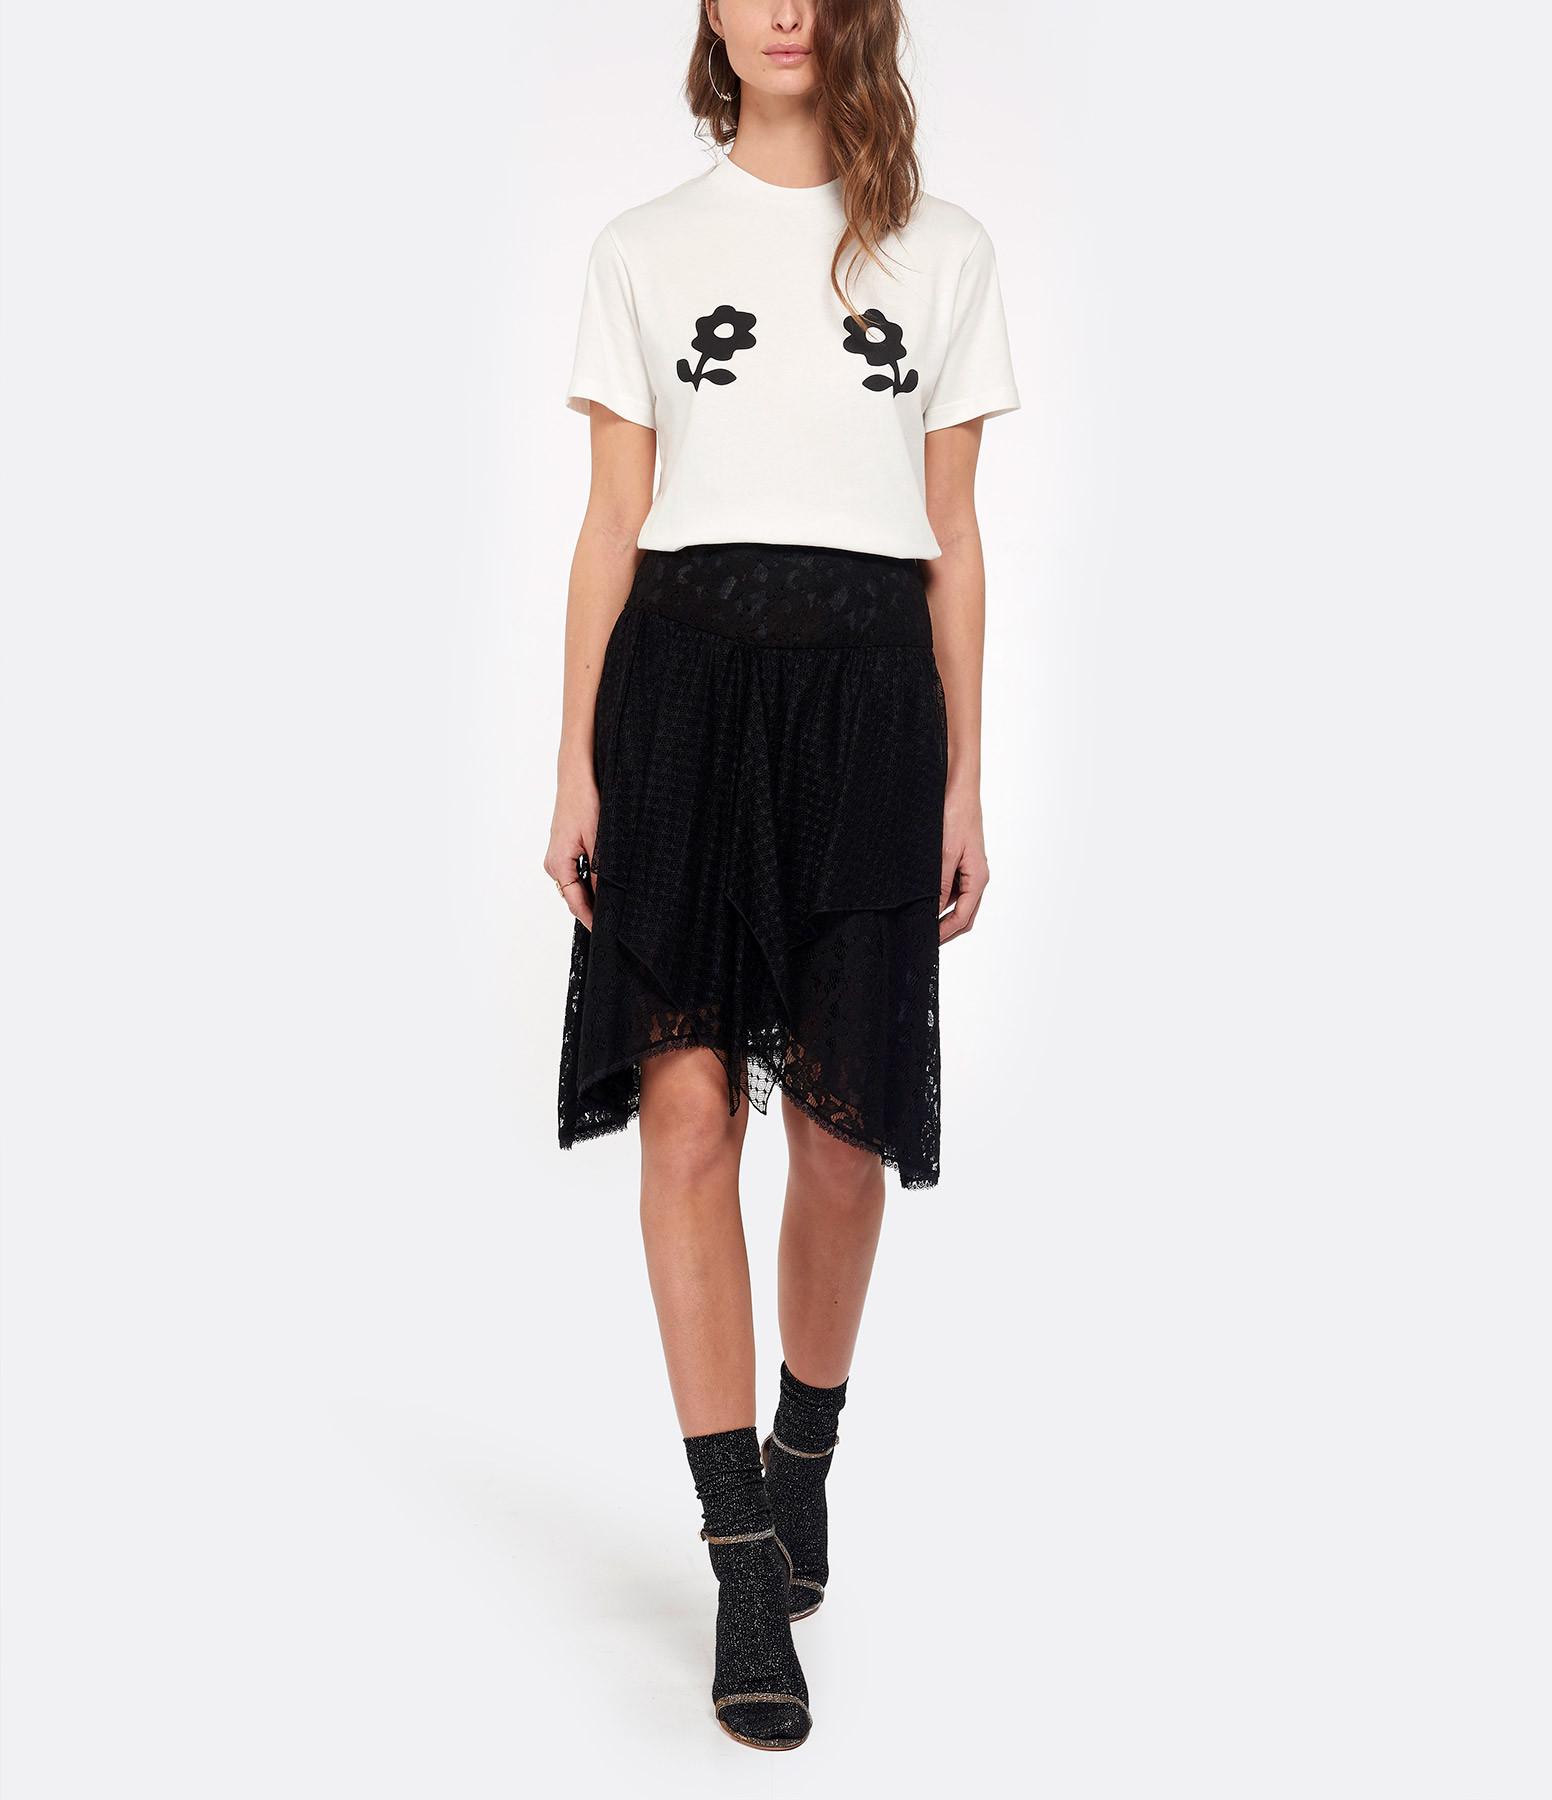 ALEXA CHUNG - Tee-shirt Daisy Ivoire